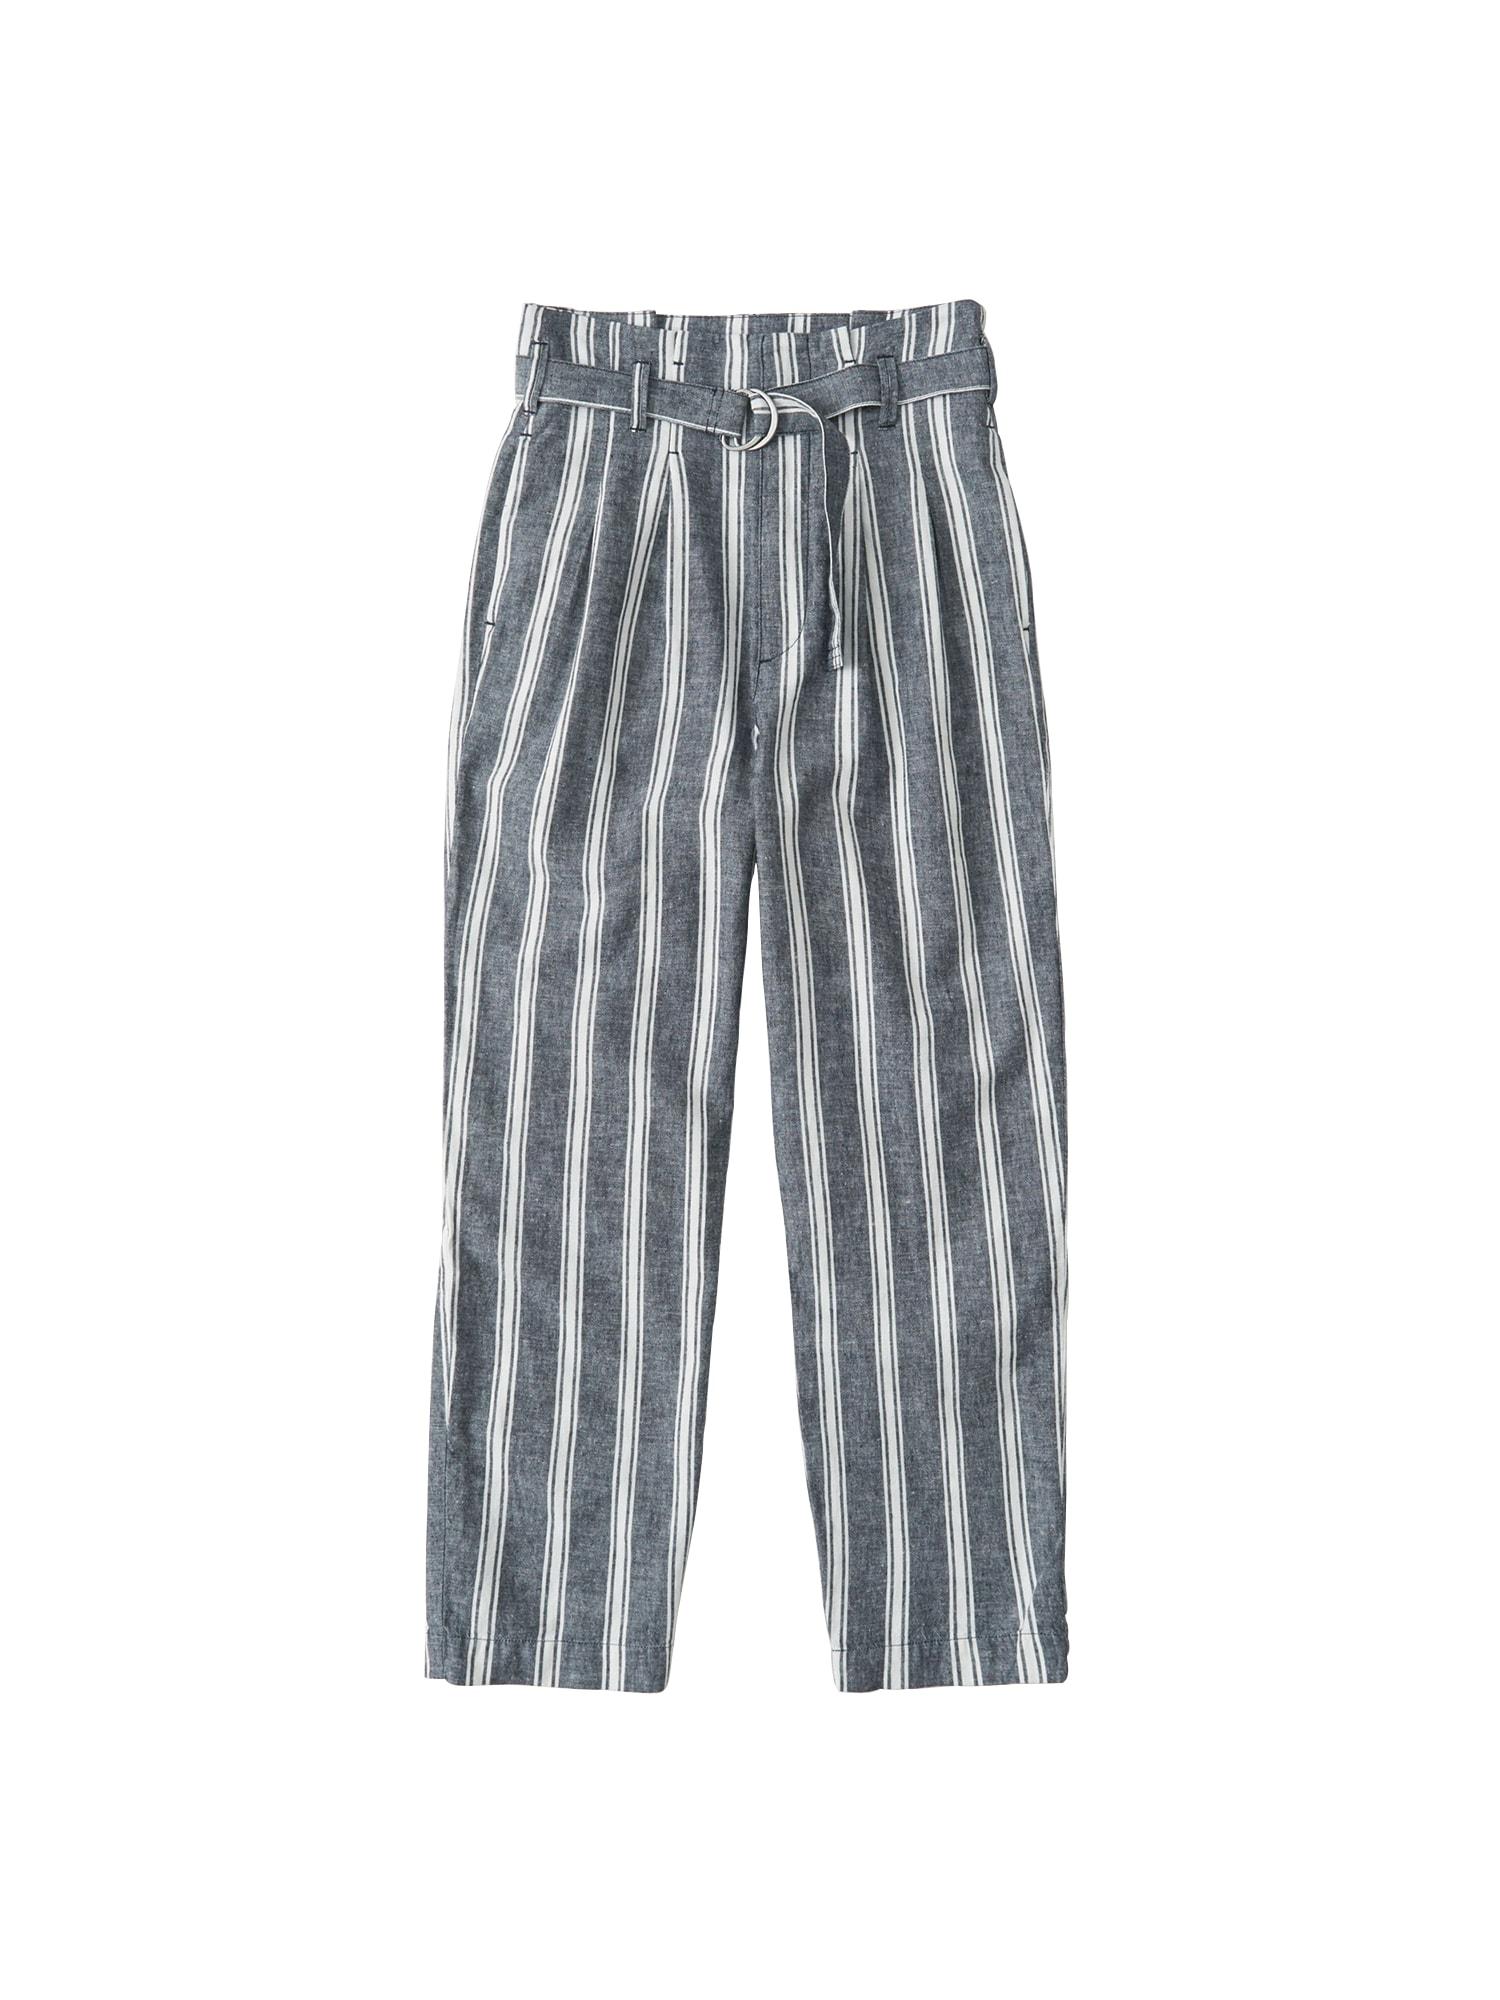 Kalhoty s puky SB19-SELF BELT TAPERED PANT modrá Abercrombie & Fitch